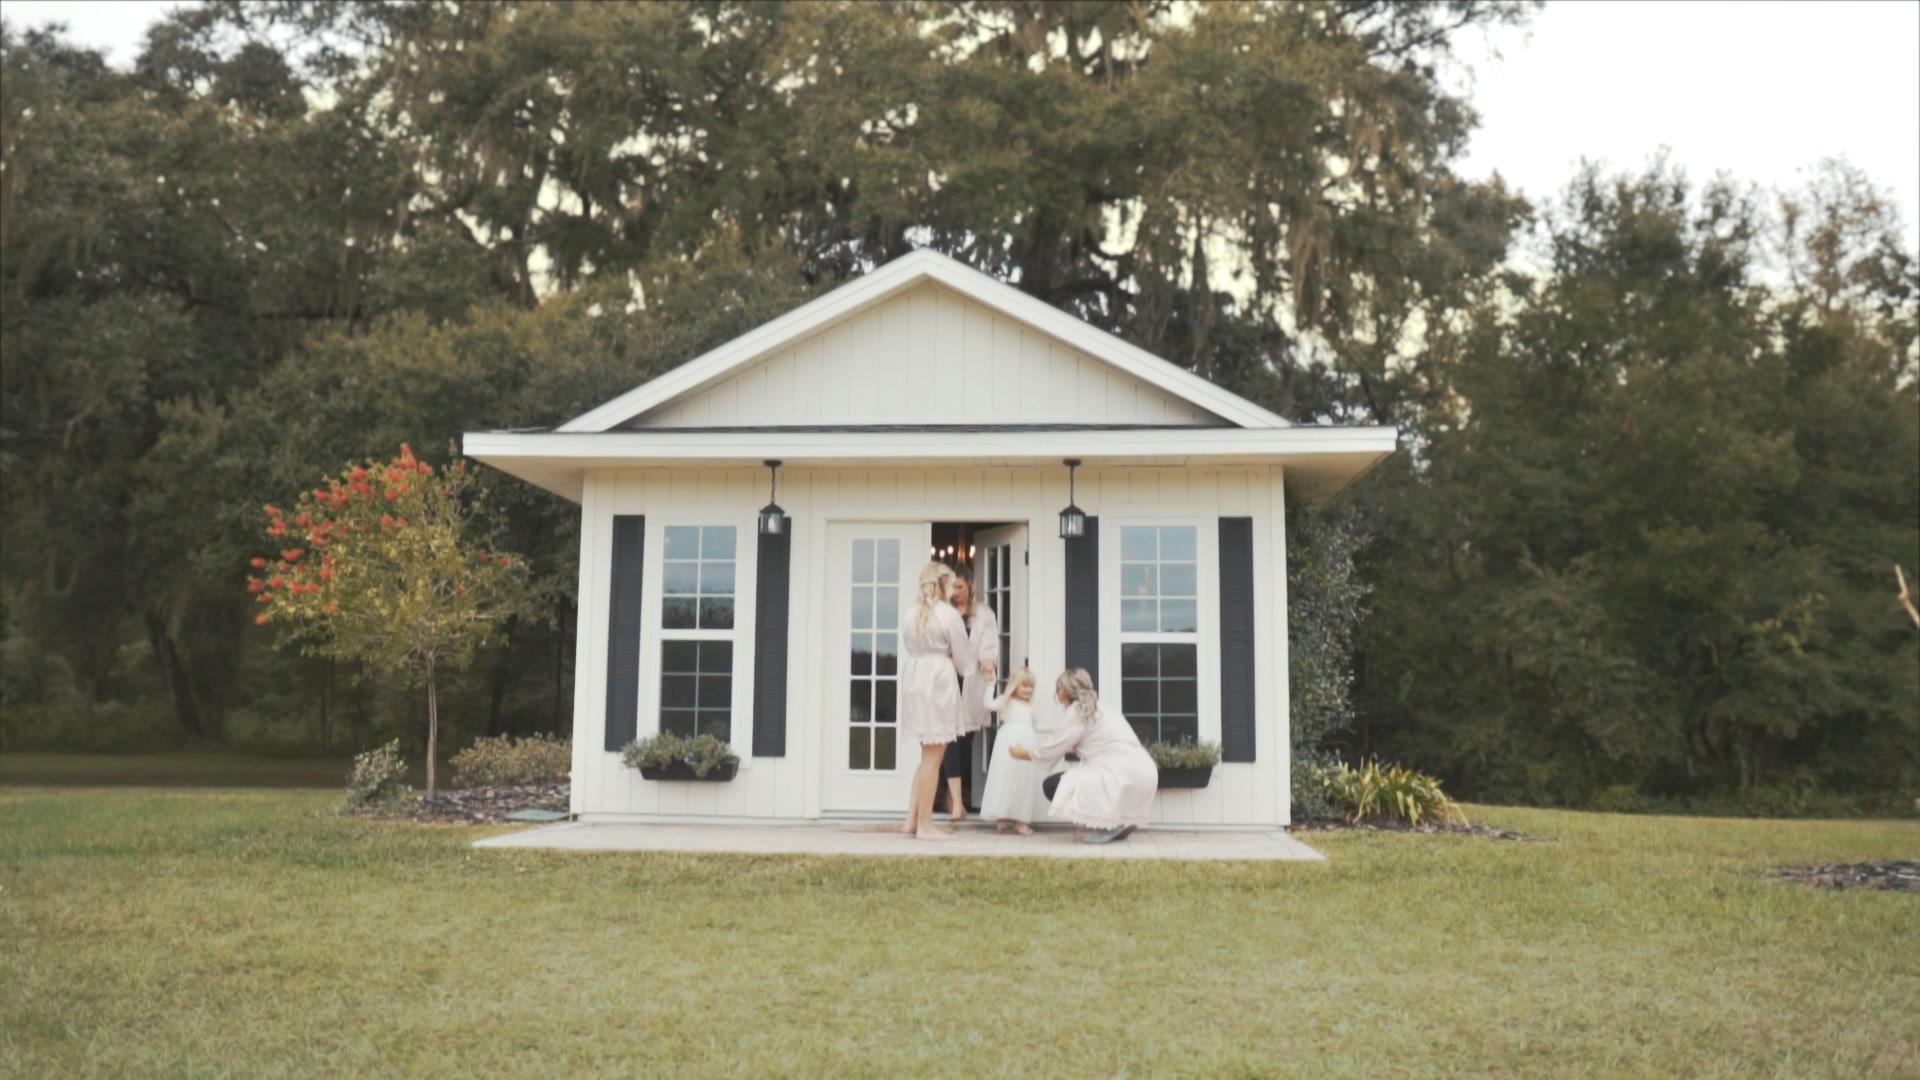 Andrew + Alexandra   Webster, Florida   October Oaks Farm